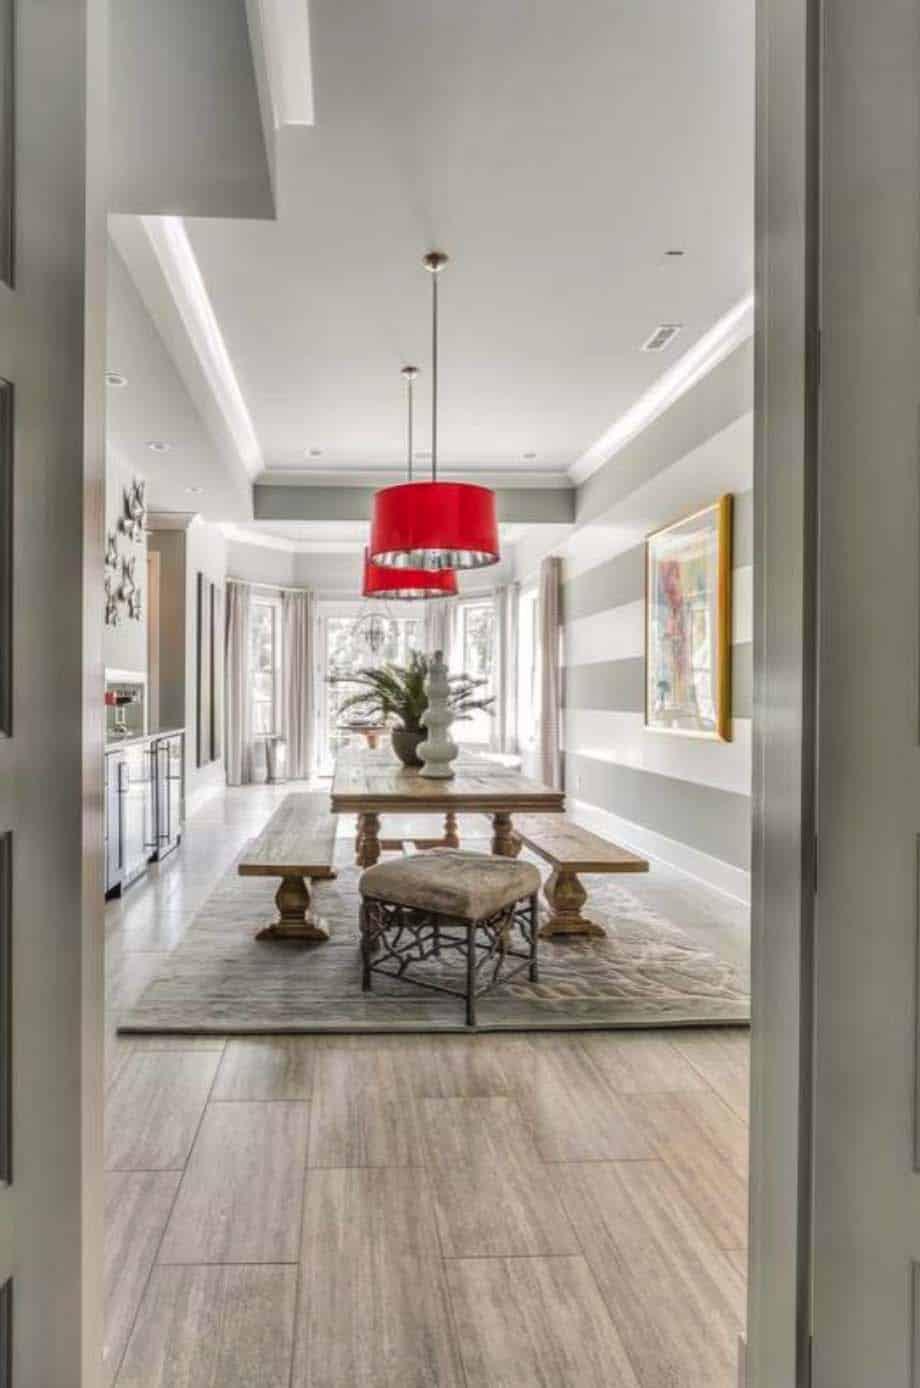 Basement Renovation Project-Eric Ross Interiors-16-1 Kindesign